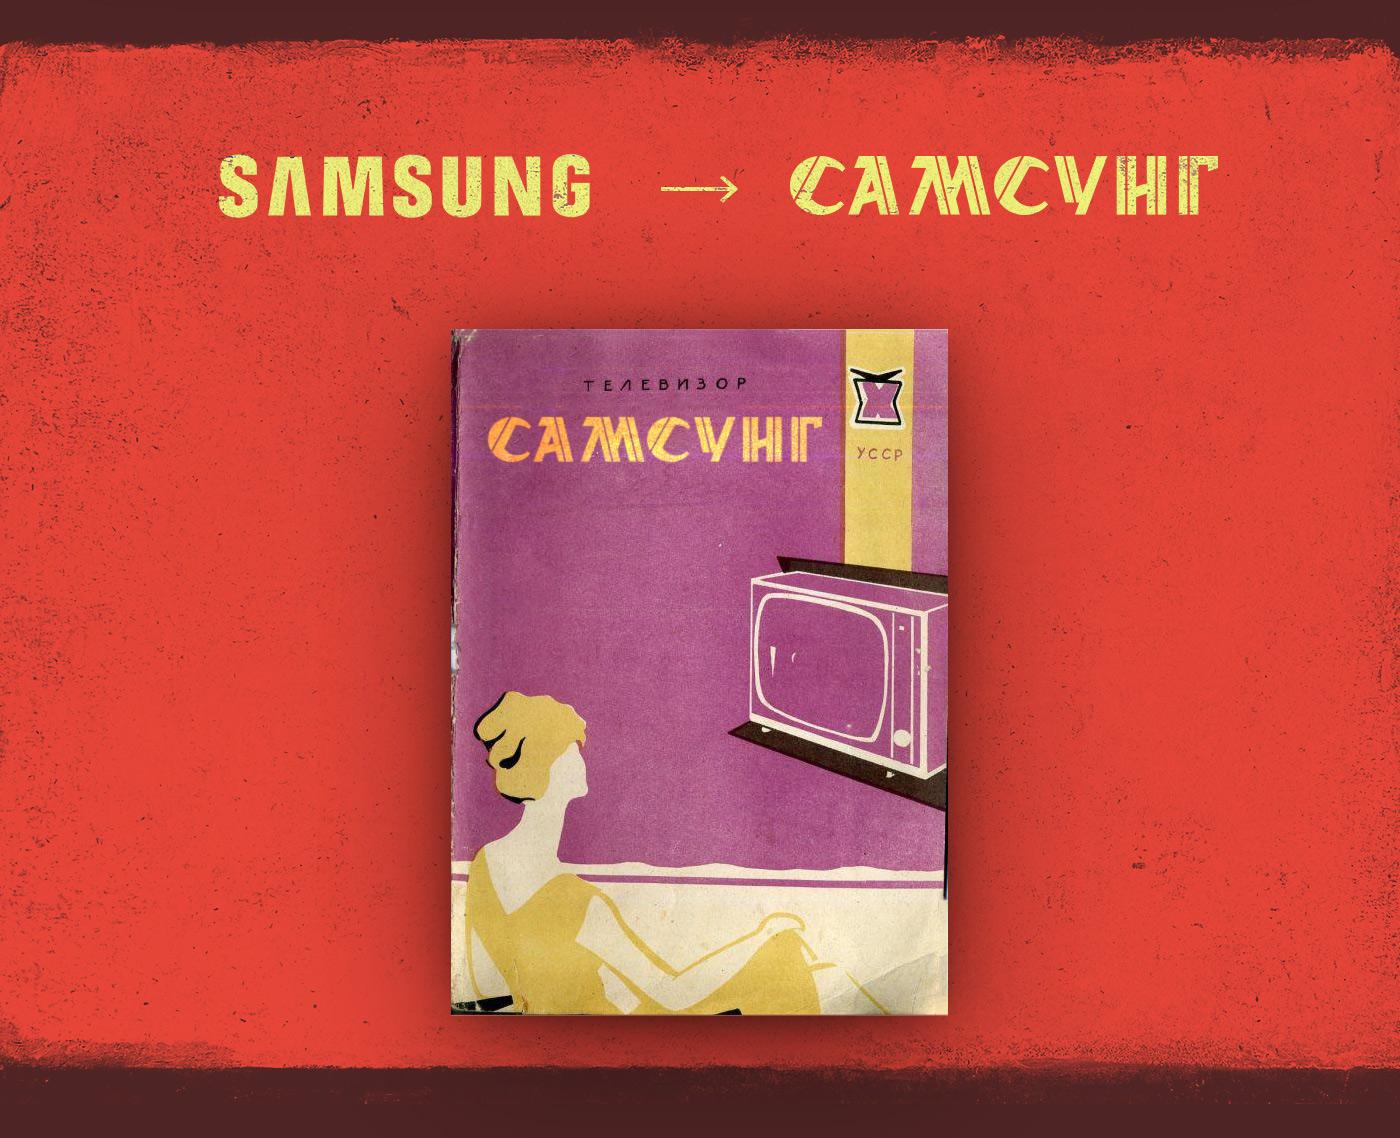 ussr Soviet Dior McDonalds chanel Nikon mersedes apple Samsung lettering